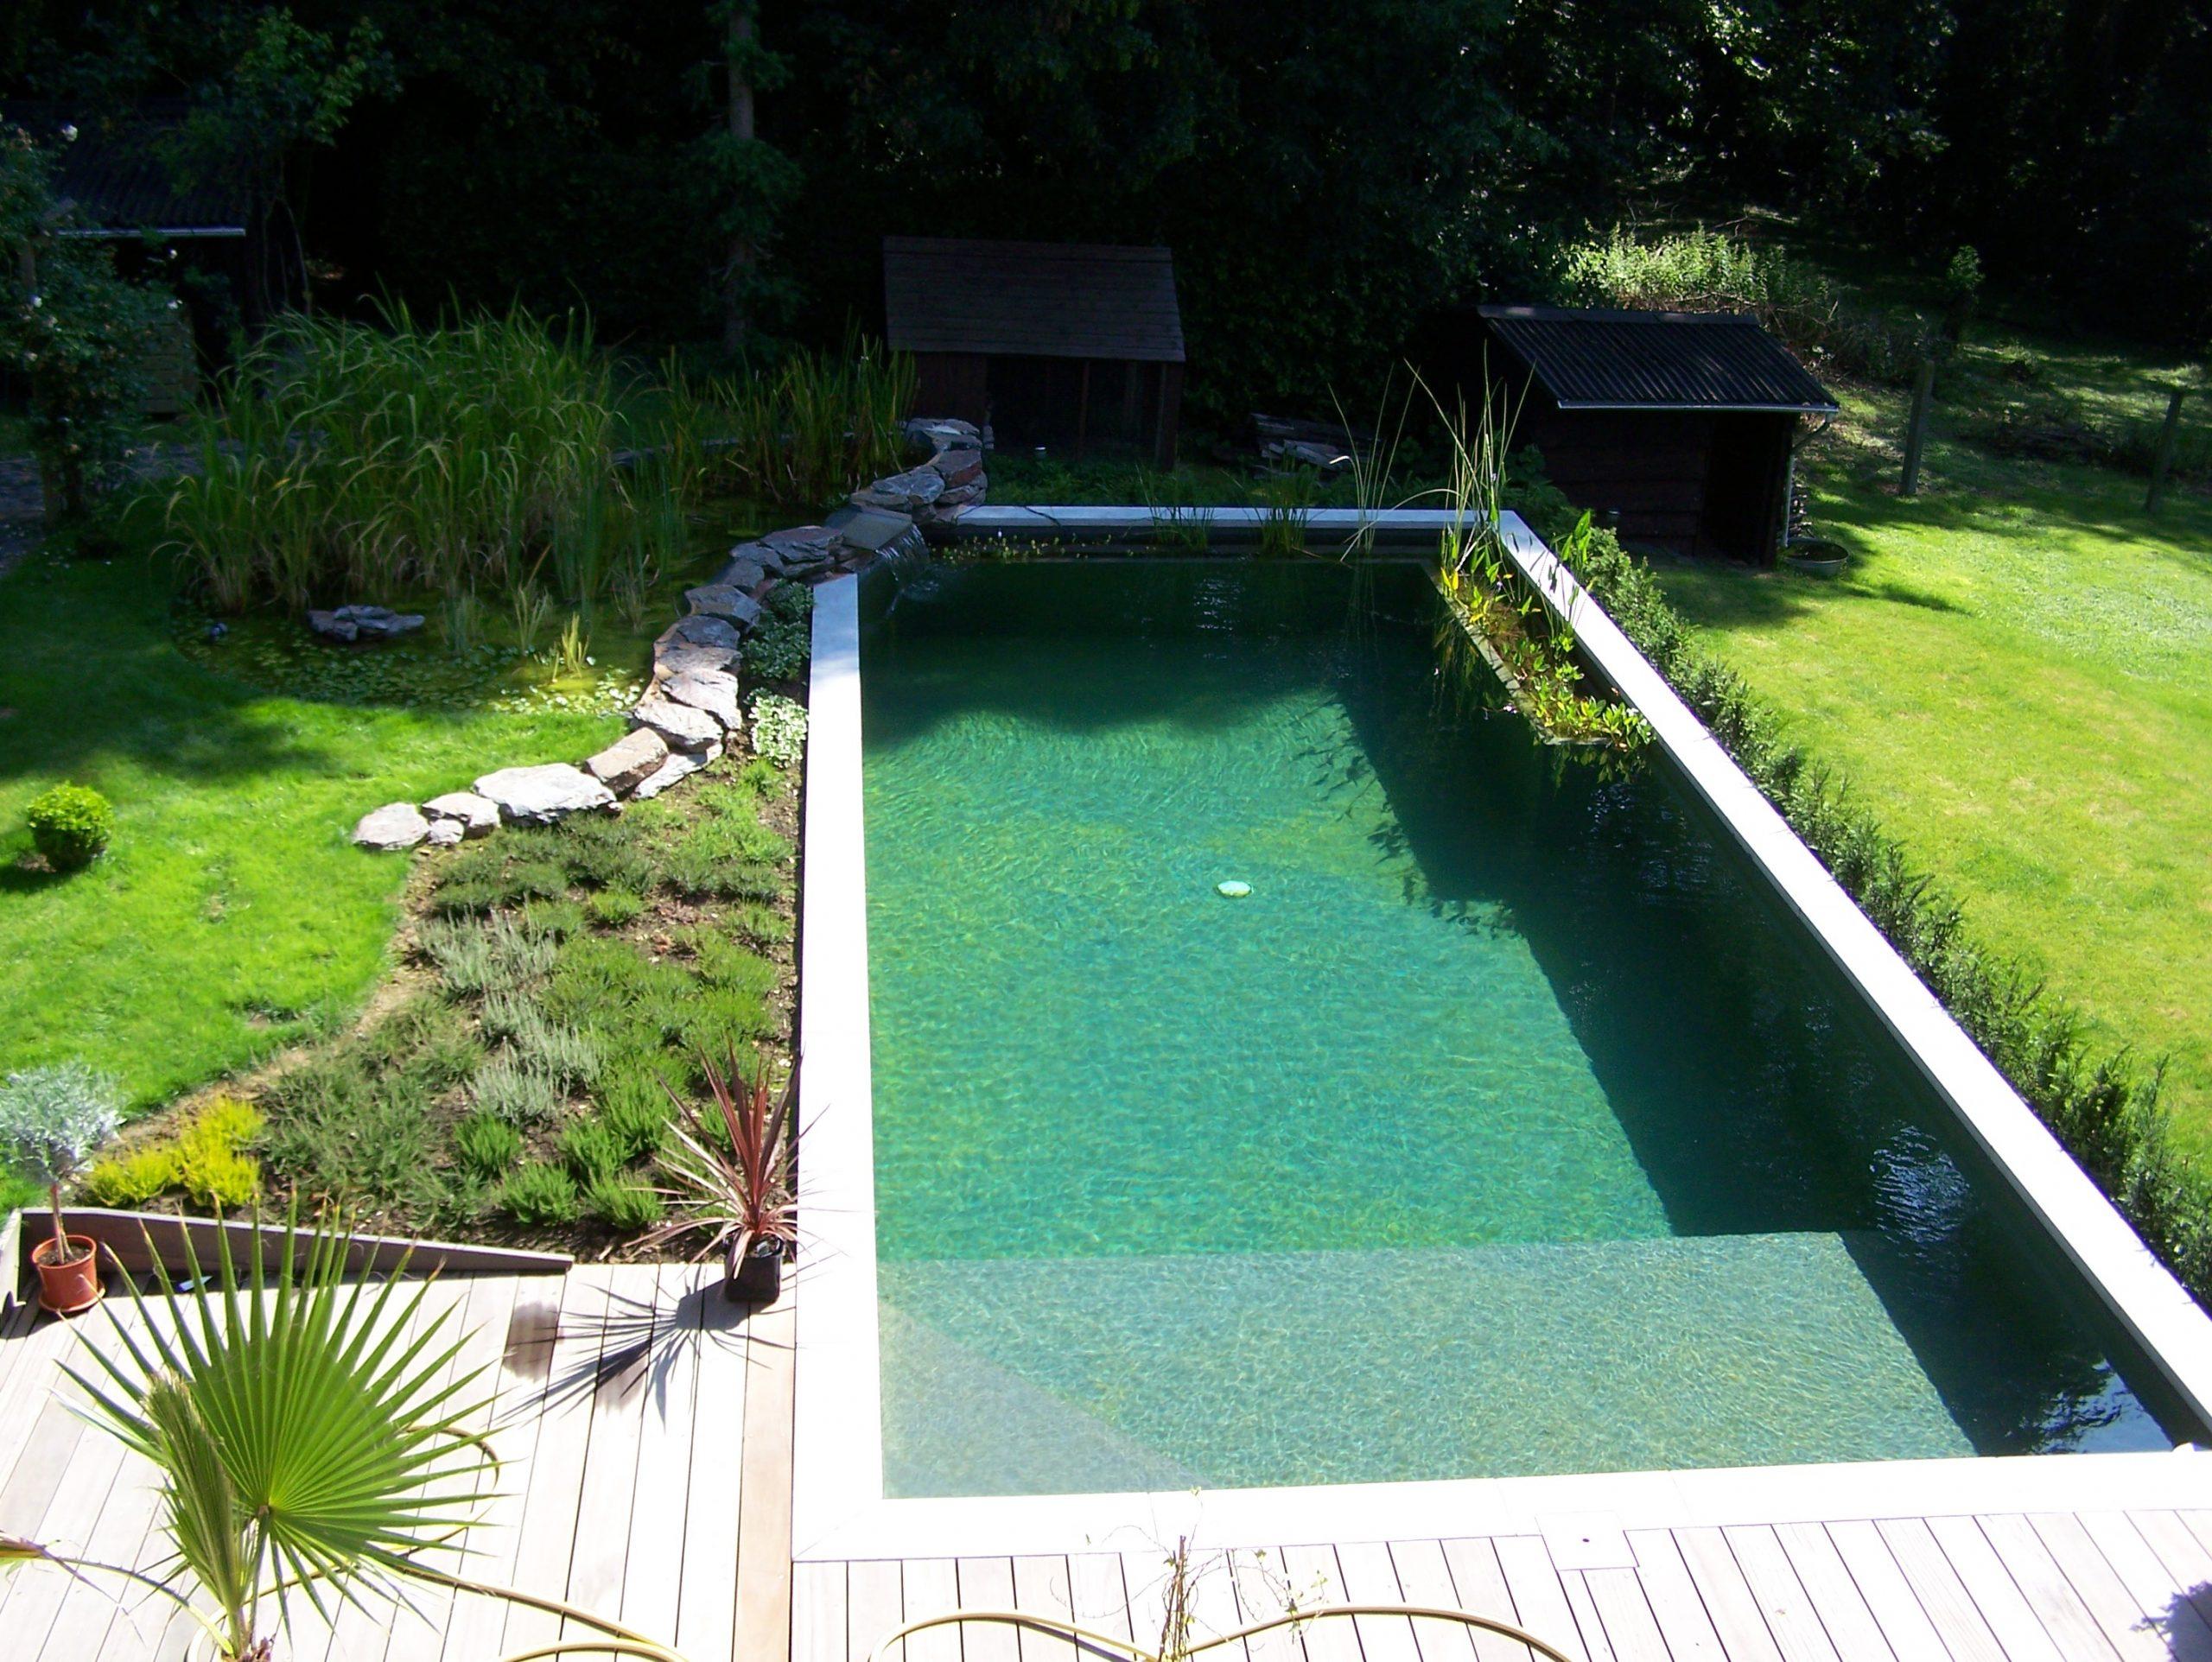 Piscine Naturelle - Aquatic Design Concept Et Garden tout Piscine Naturelle En Kit